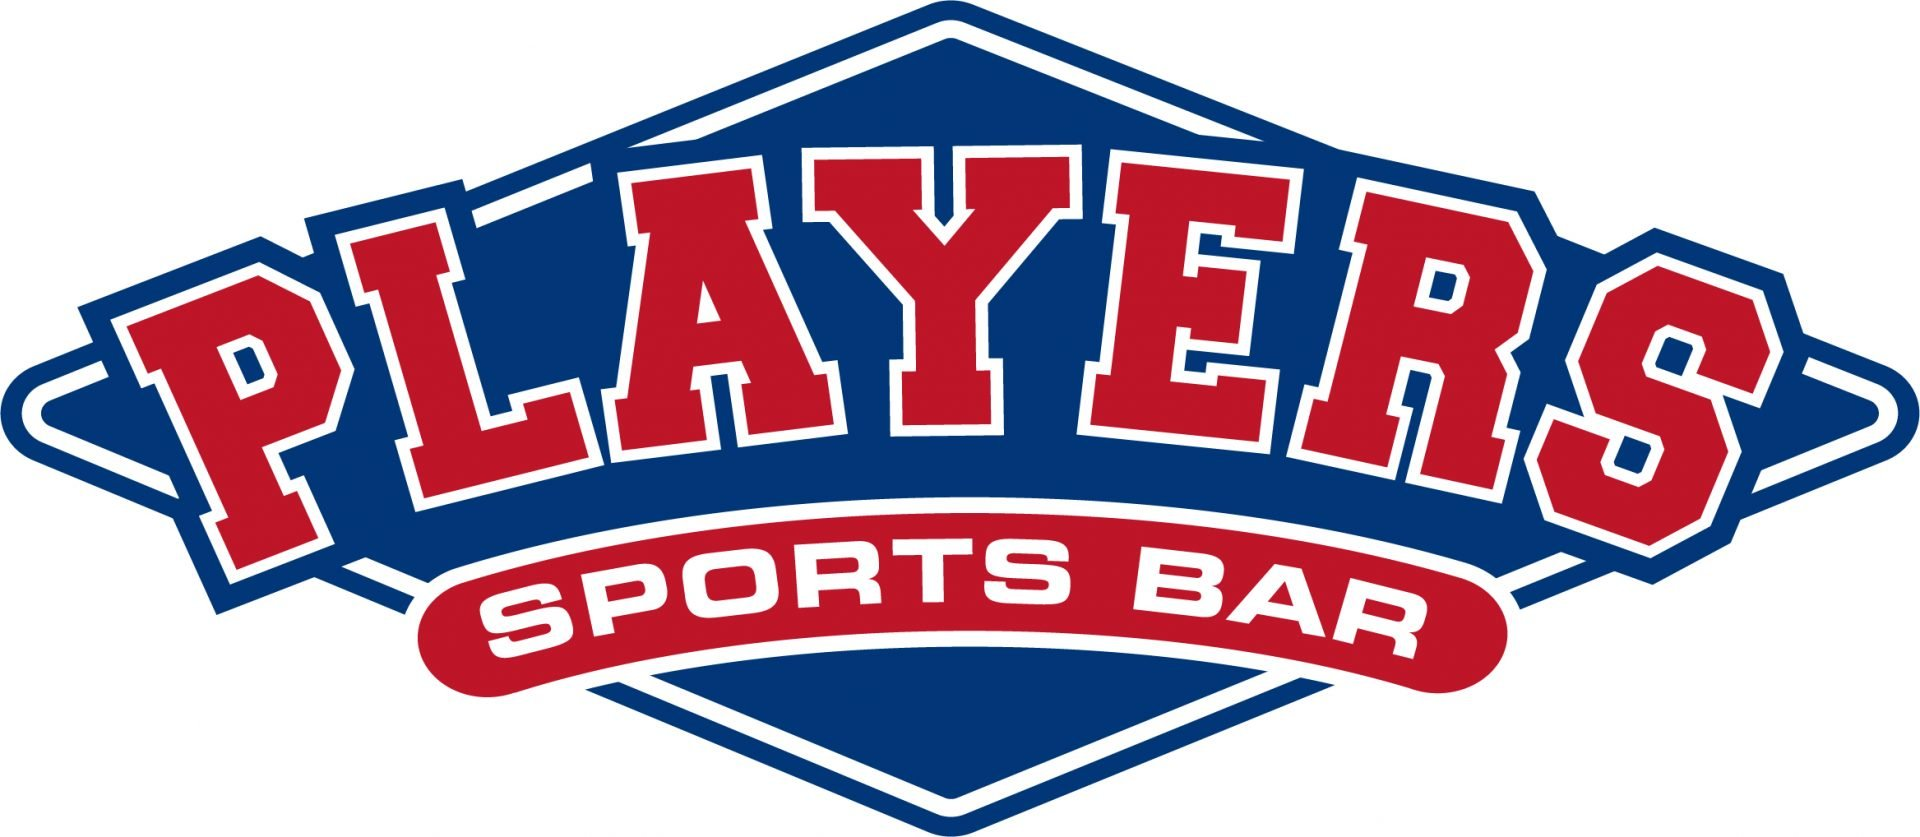 Players Sports Bar Logo